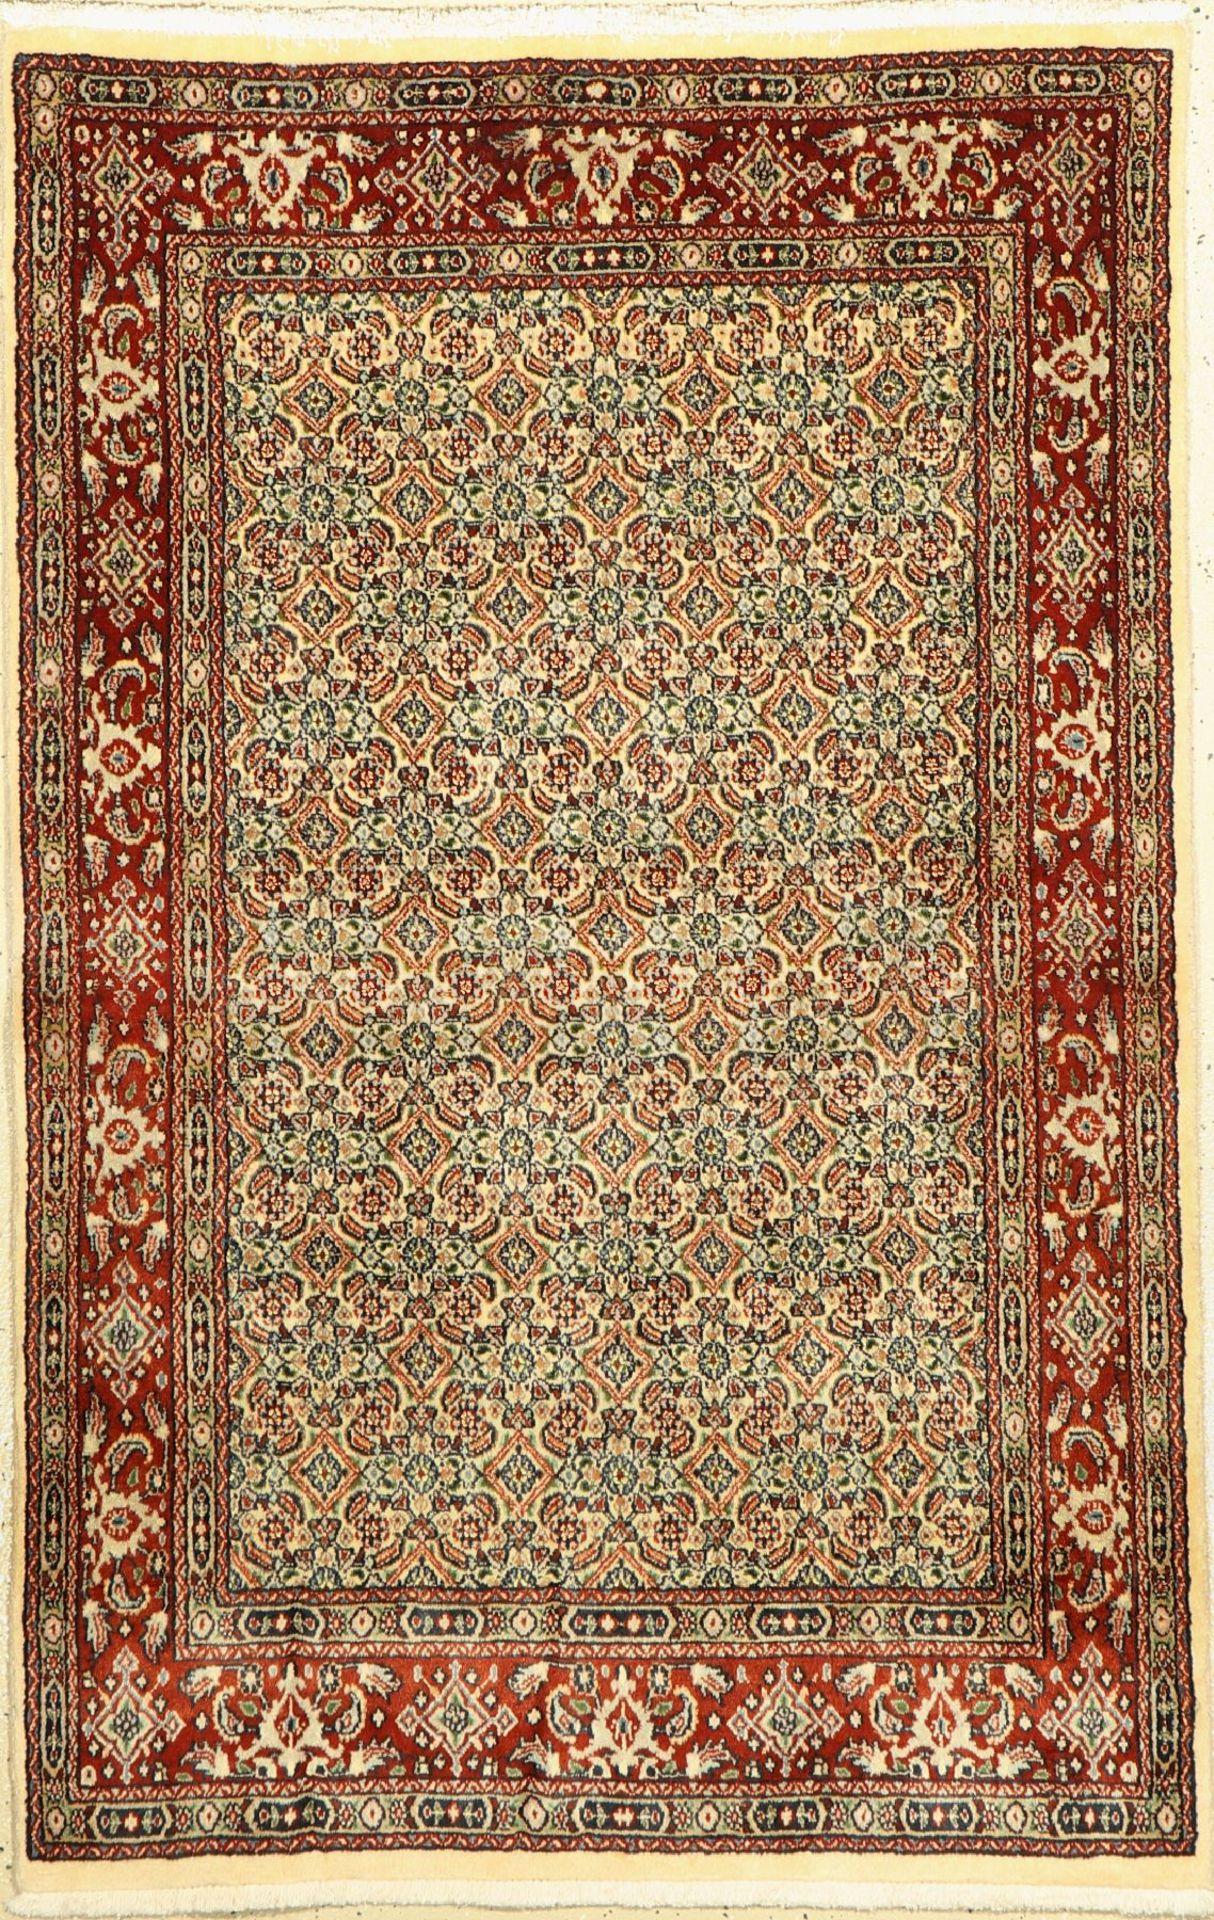 Mud fein, Persien, Korkwolle, ca. 150 x 105cm, EHZ: 2Moud Rug, Persia, wool/cotton, approx. 150 x